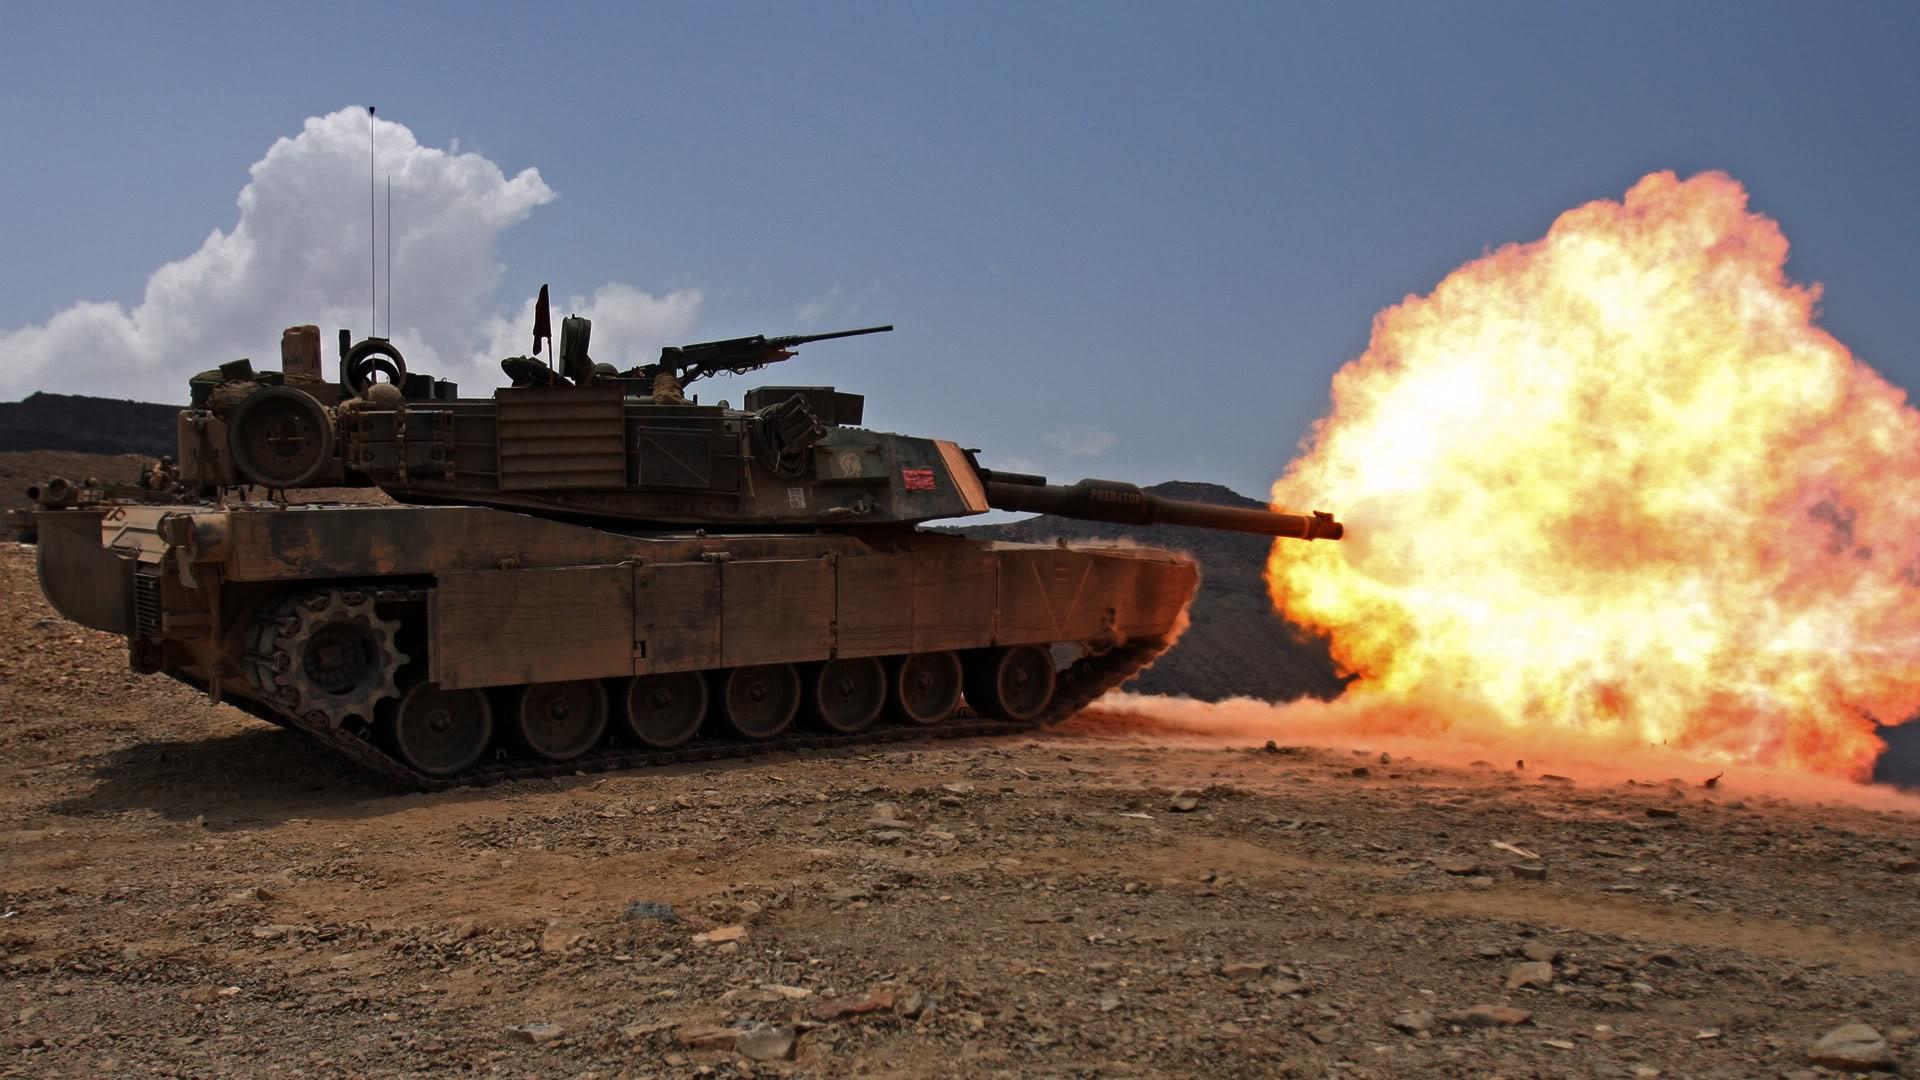 m1-abrams-tank-firing-hd-wallpaper